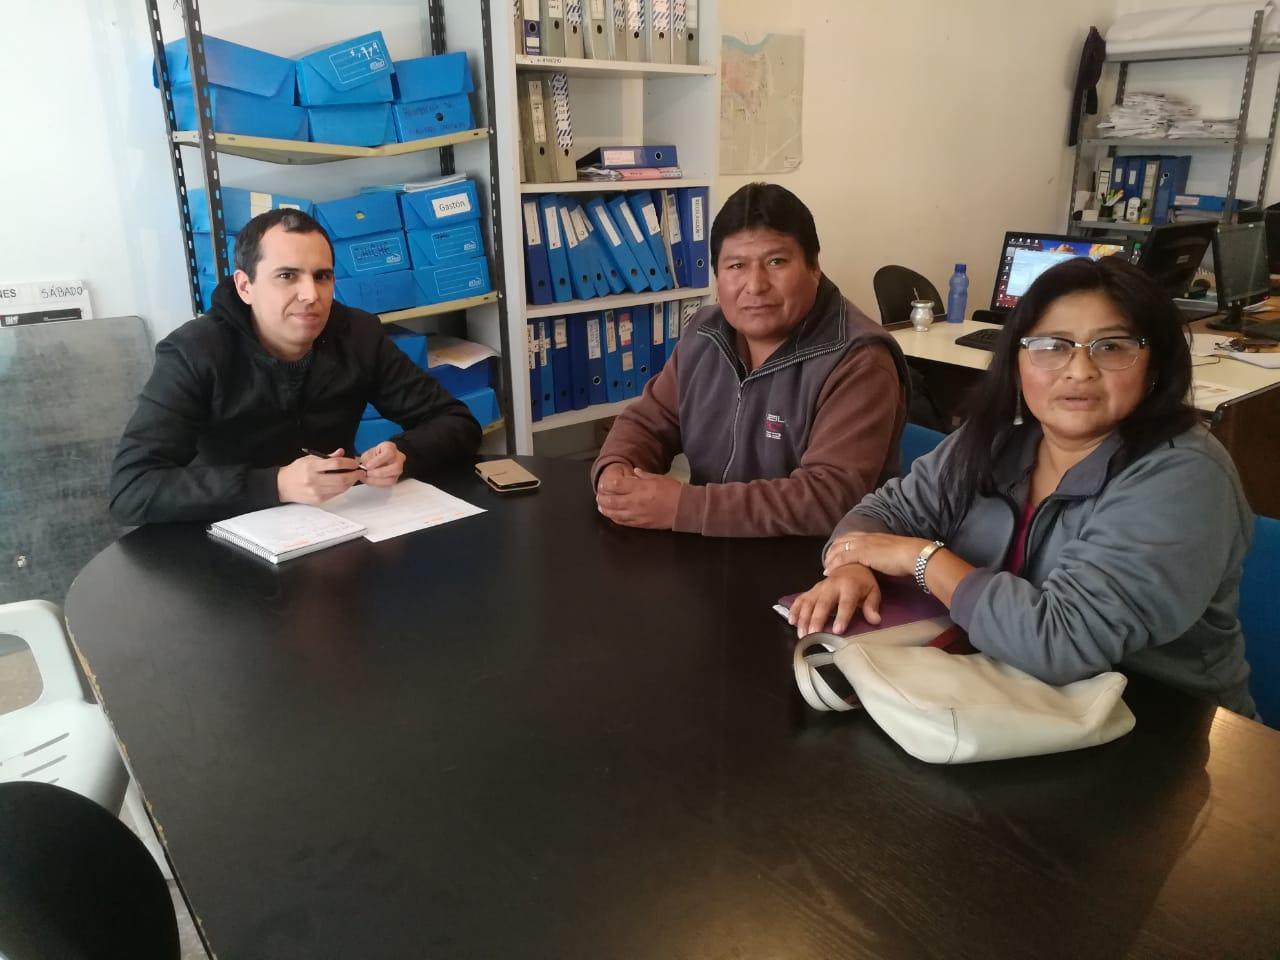 El Municipio gestiona el consulado móvil de Bolivia